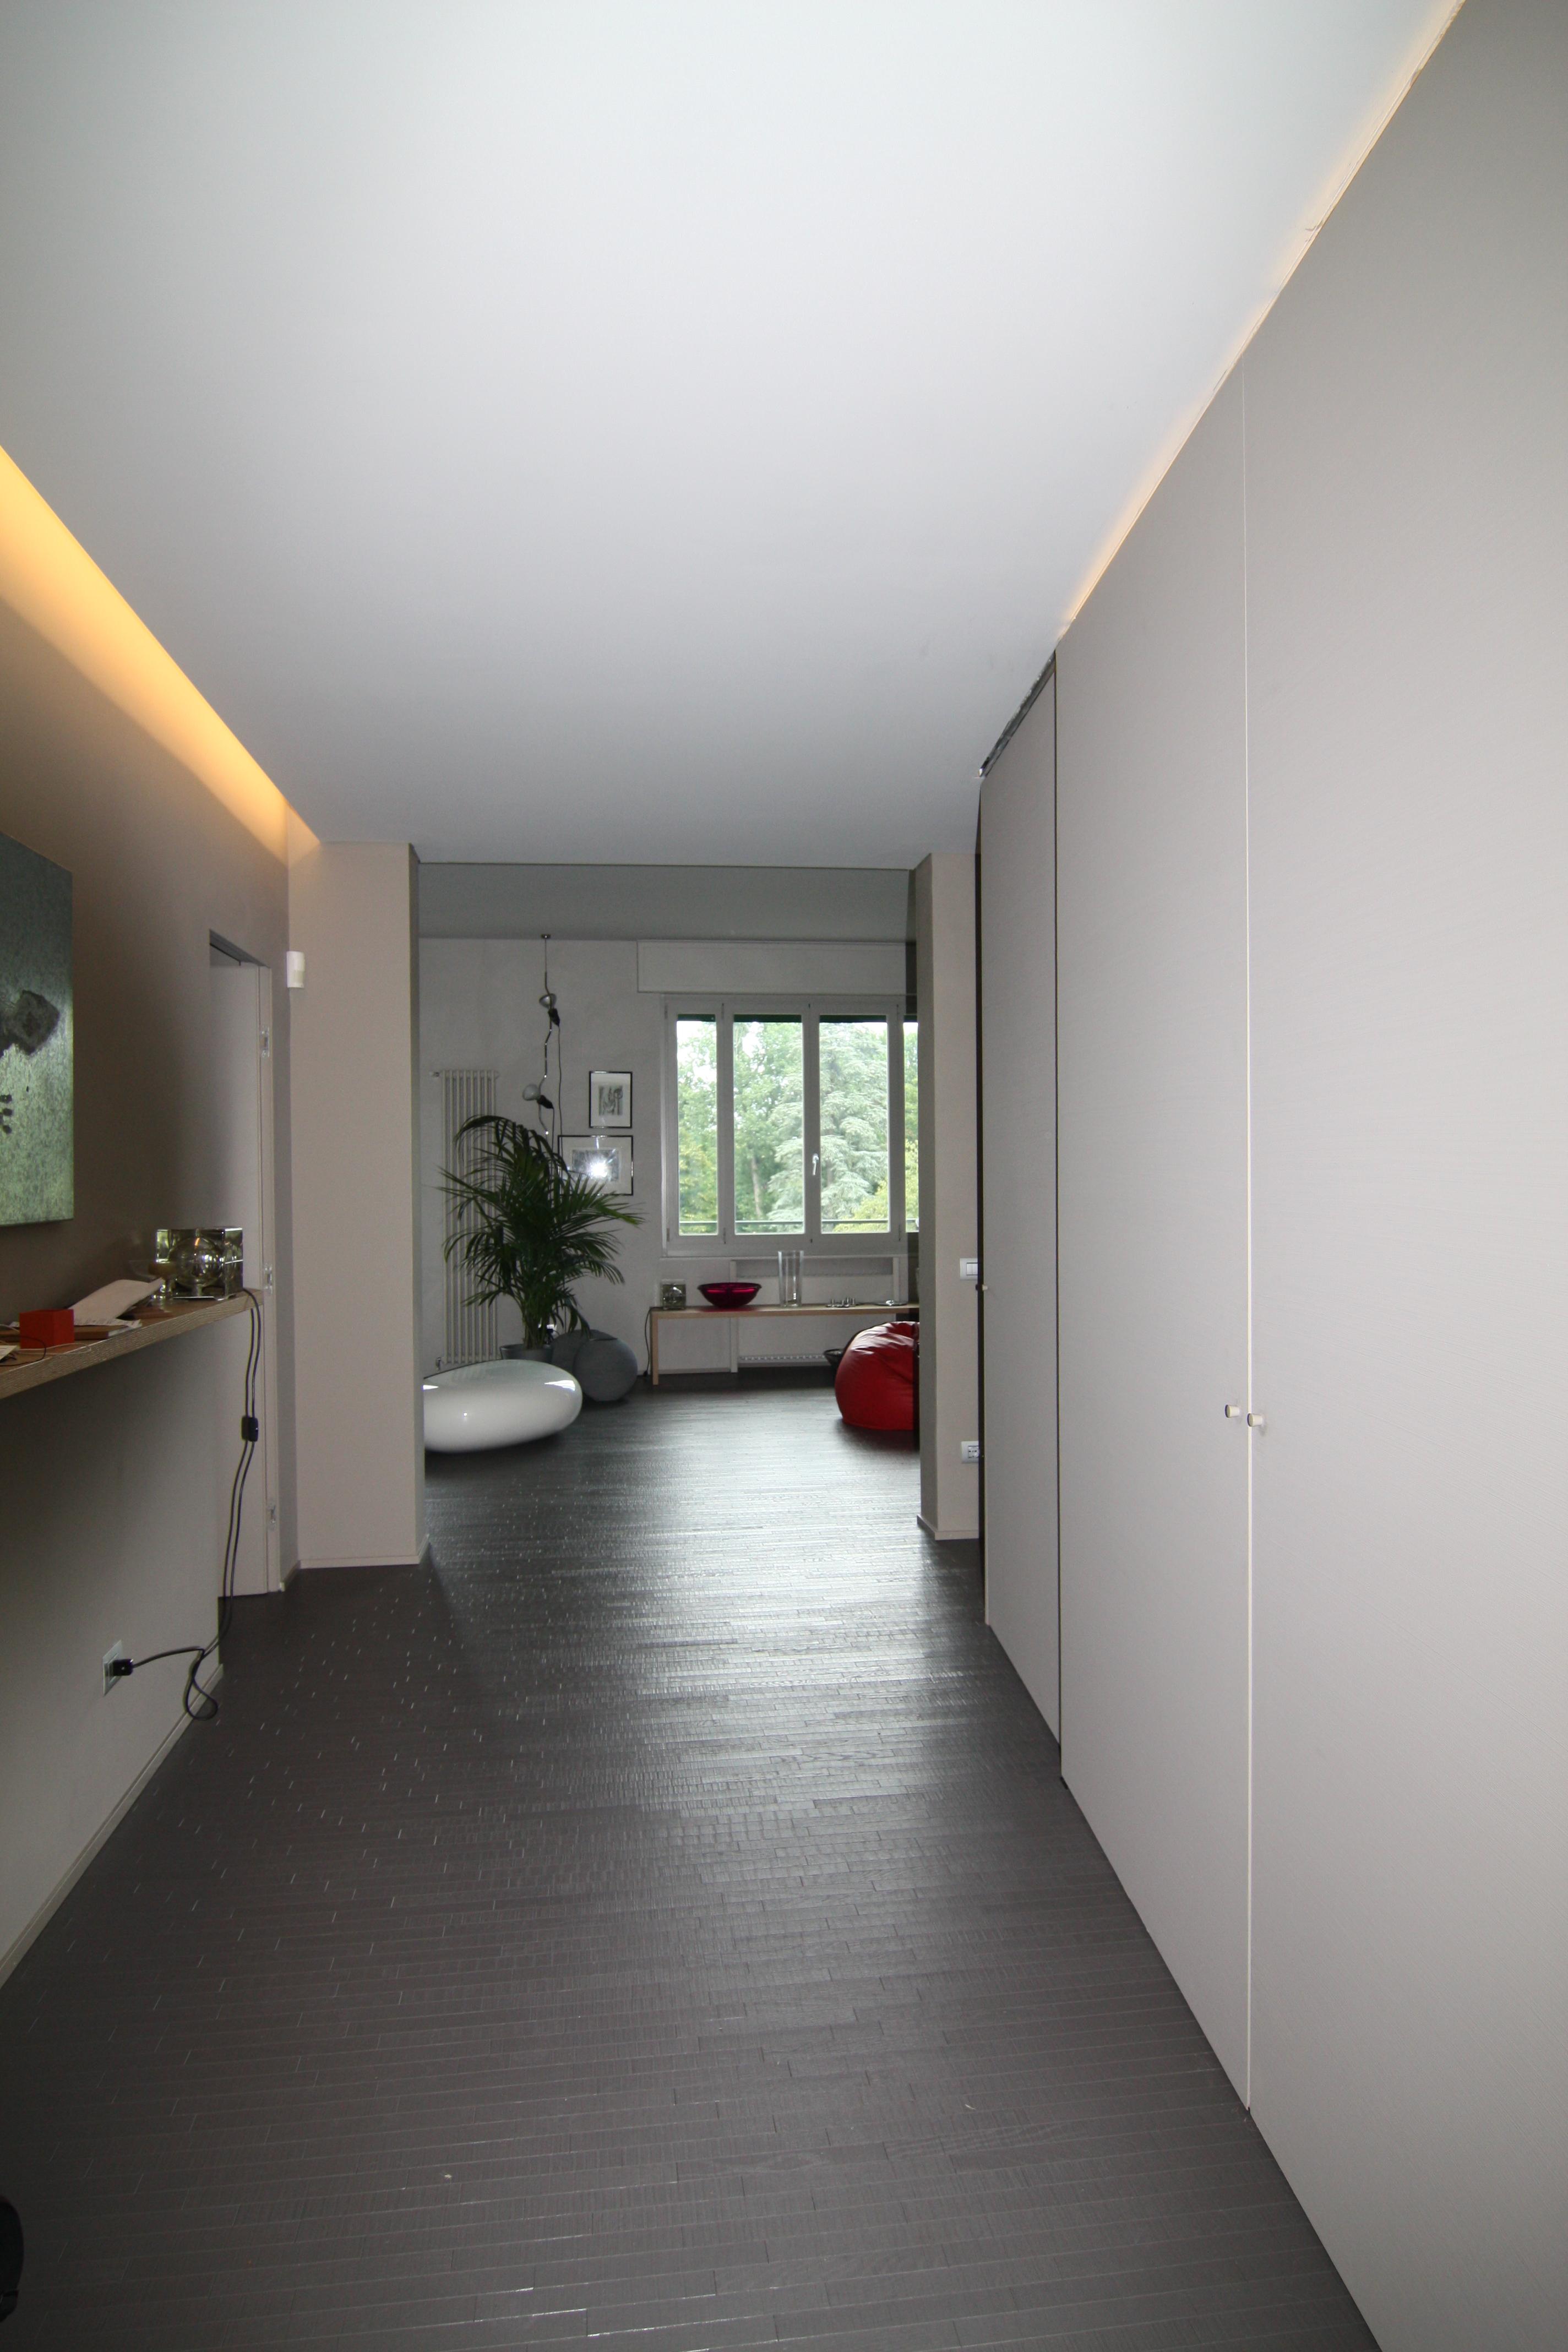 Kerakoll Resine Per Pavimenti.Posa Pavimenti E Rivestimenti In Resina A Parma Design